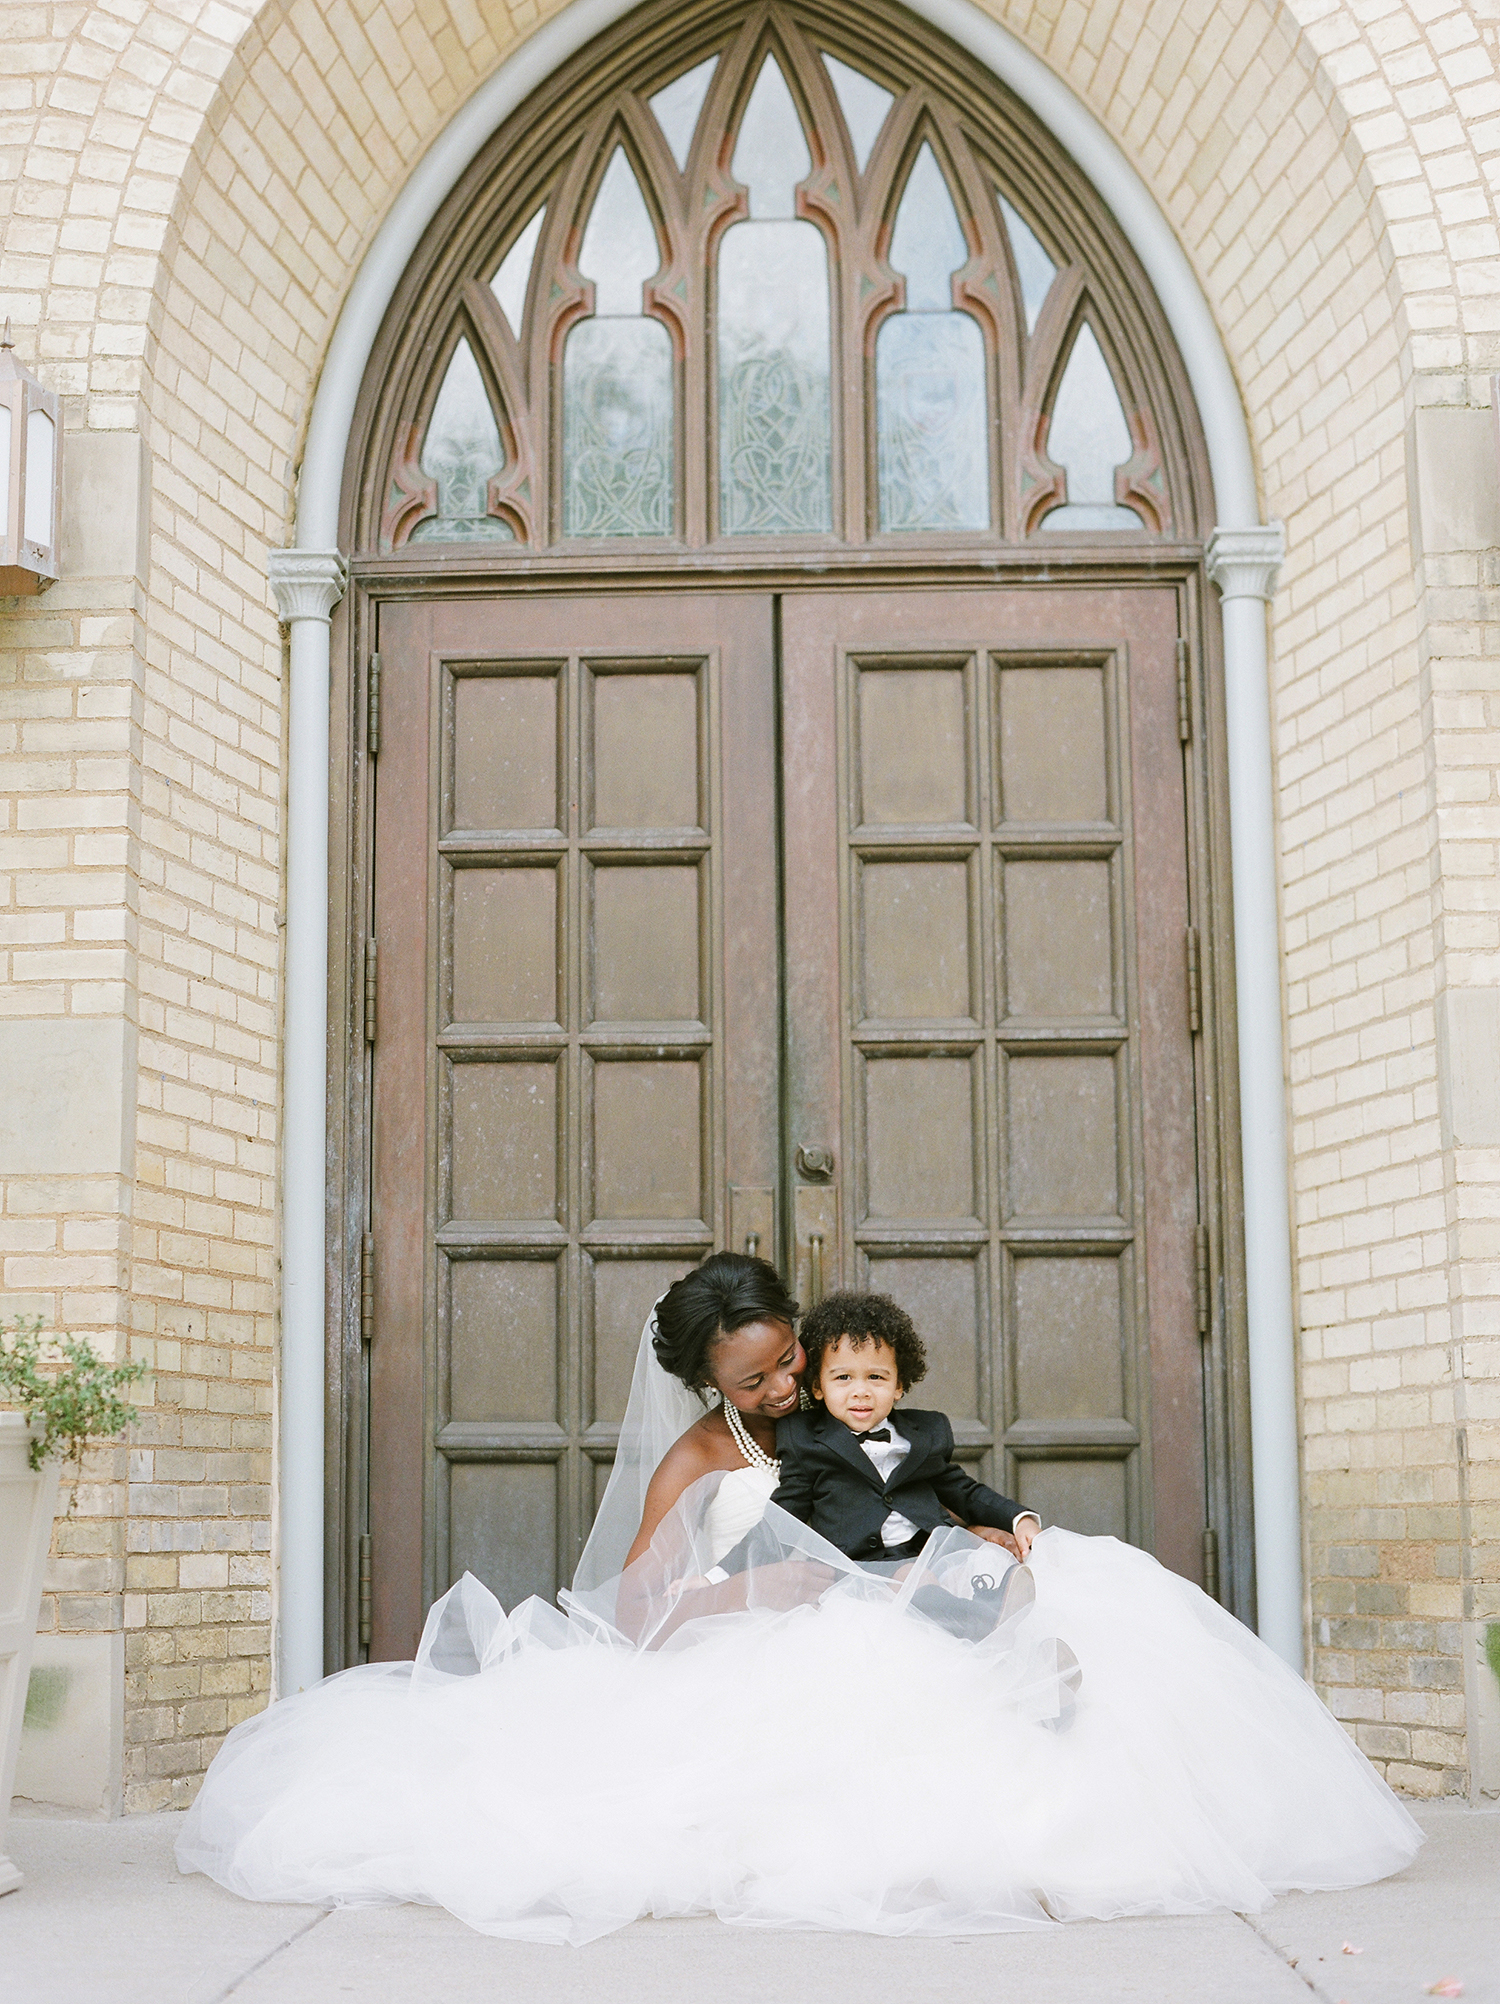 anwuli patrick wedding ring bearer and bride